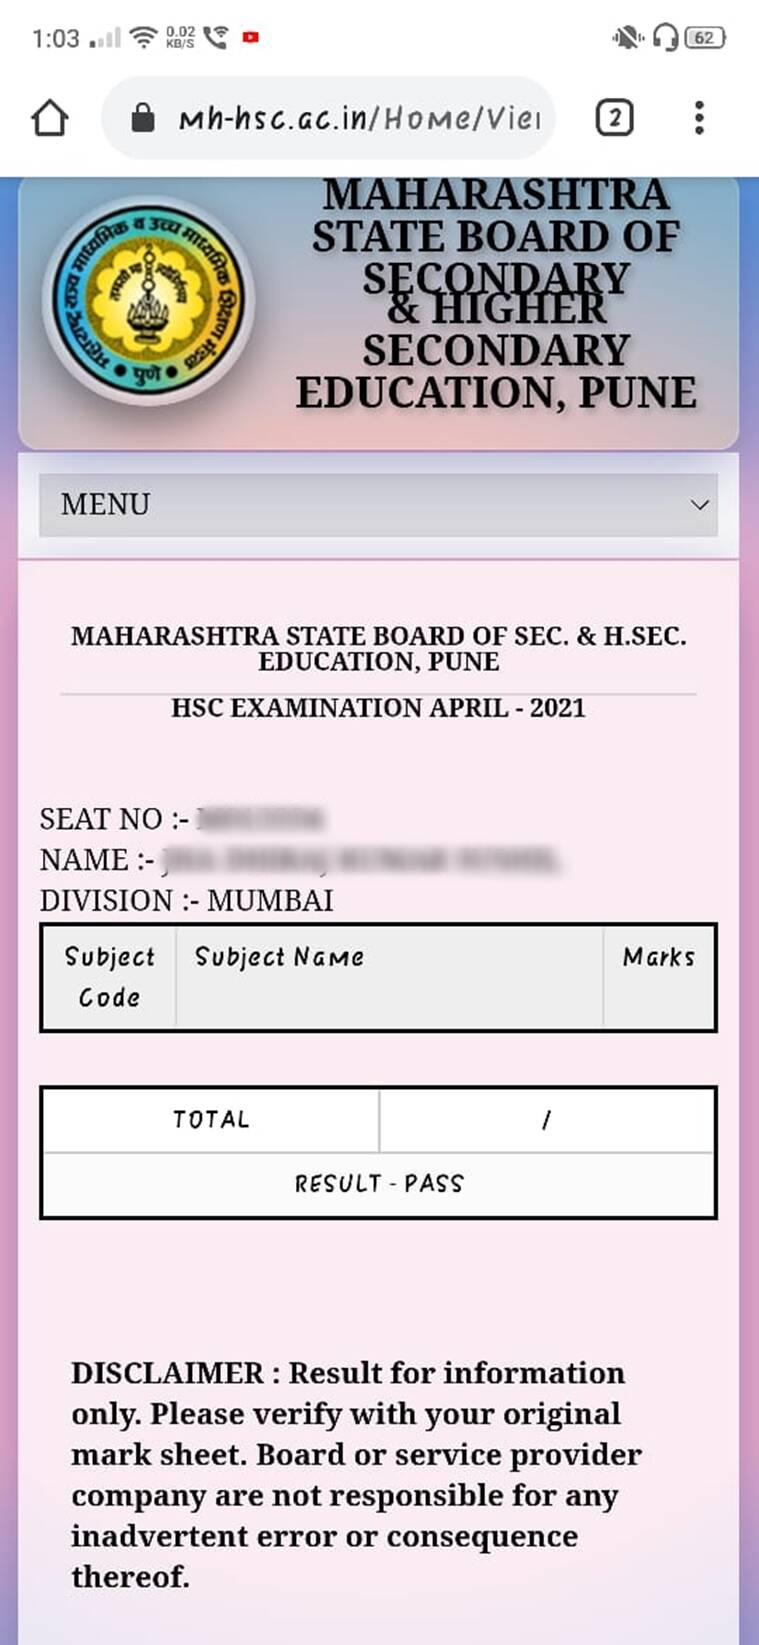 Maharashtra Class XII result, Class 12 result Maharashtra, MSBS class xii result, Maharashtra board Class 12 result date, Class 12 result maharashtra date time, maharashtra class 12 result fake